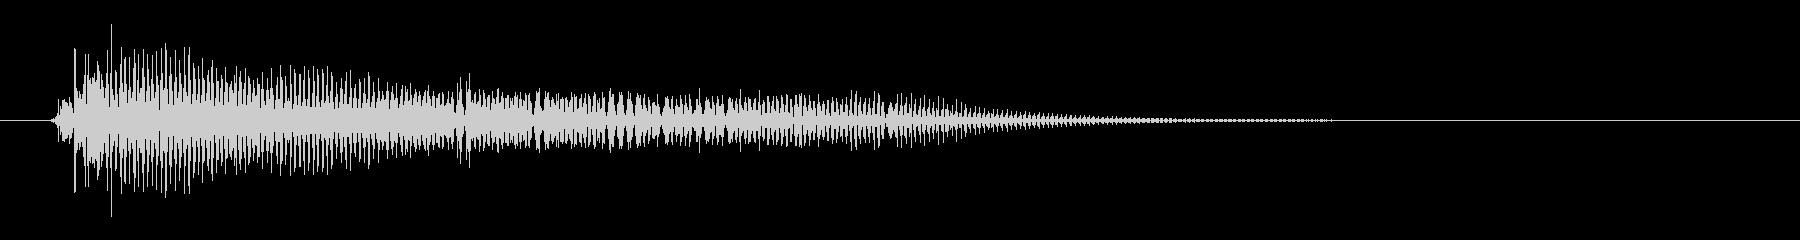 FI デバイス スペースソーショート03の未再生の波形